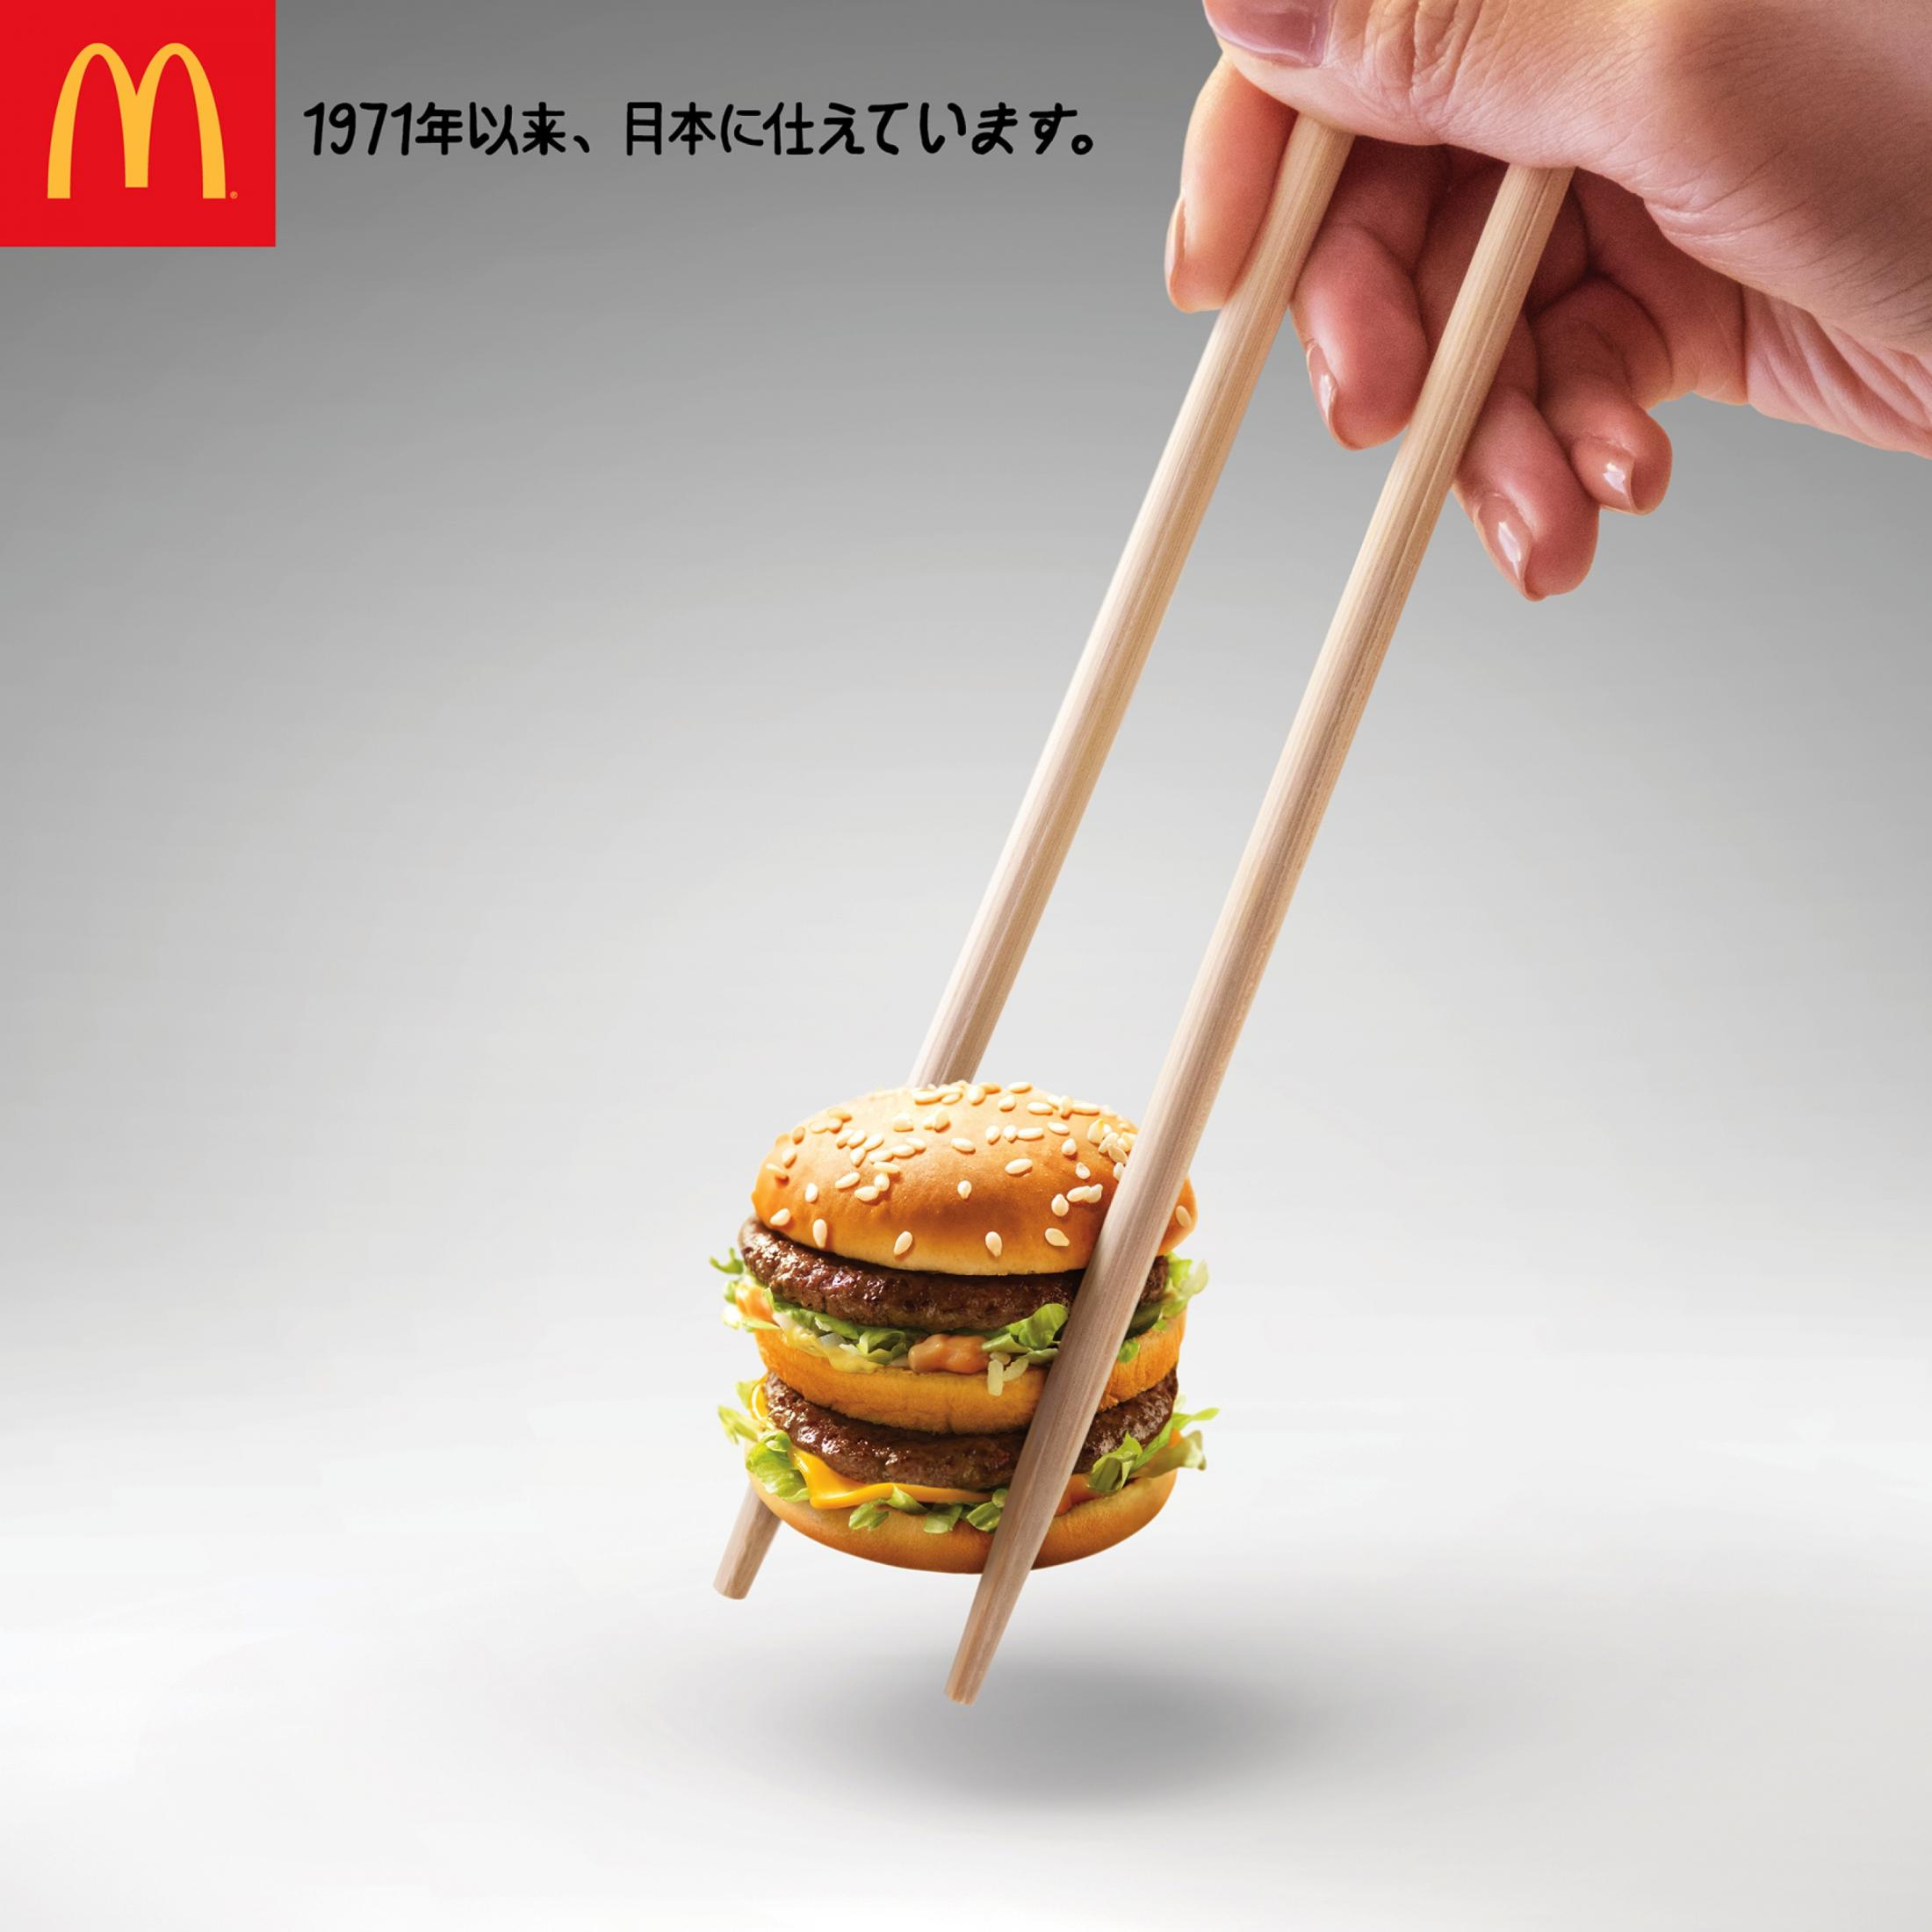 McDonald's Outdoor Ad - Japan